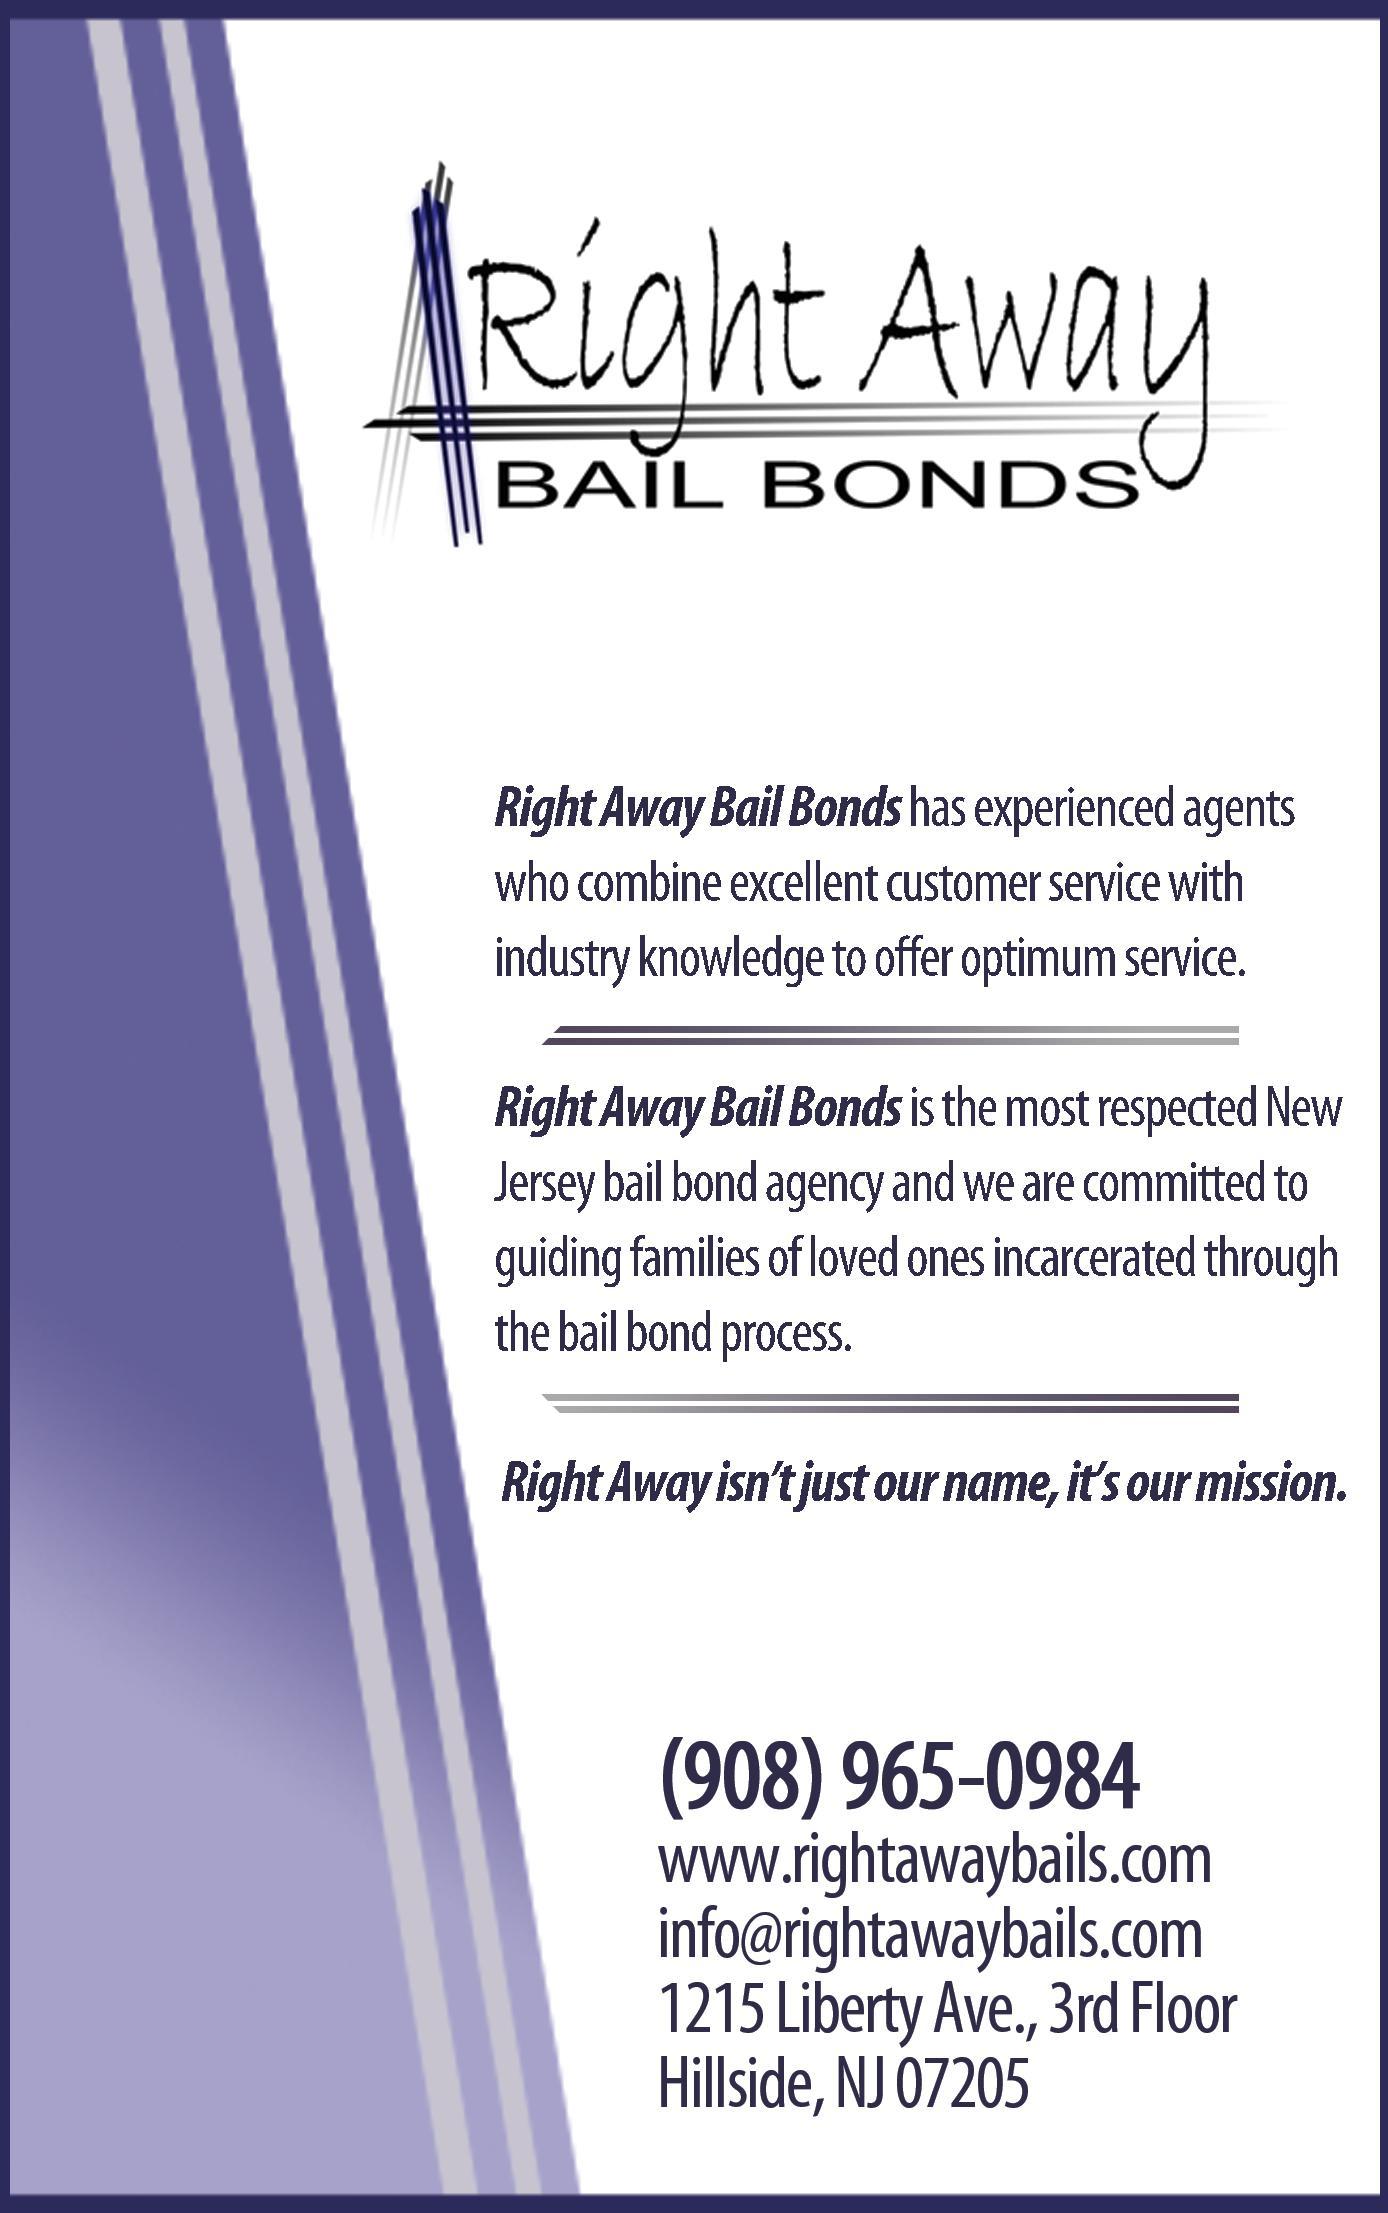 Right Away Bail Bonds